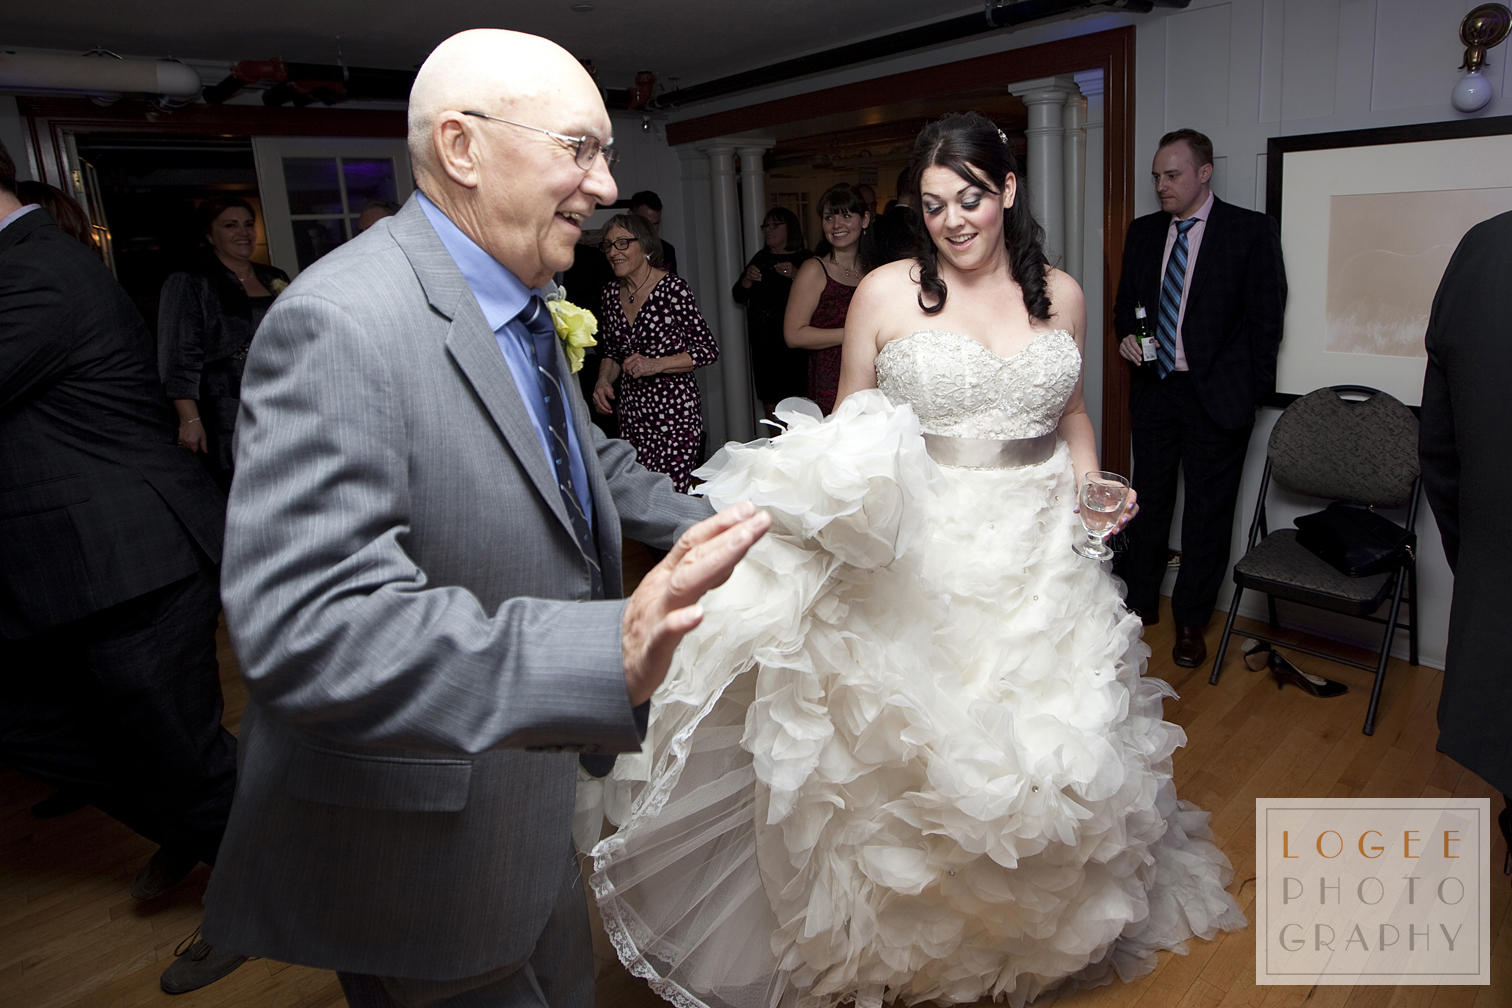 McIntosh-Burns Wedding - 7265Aw